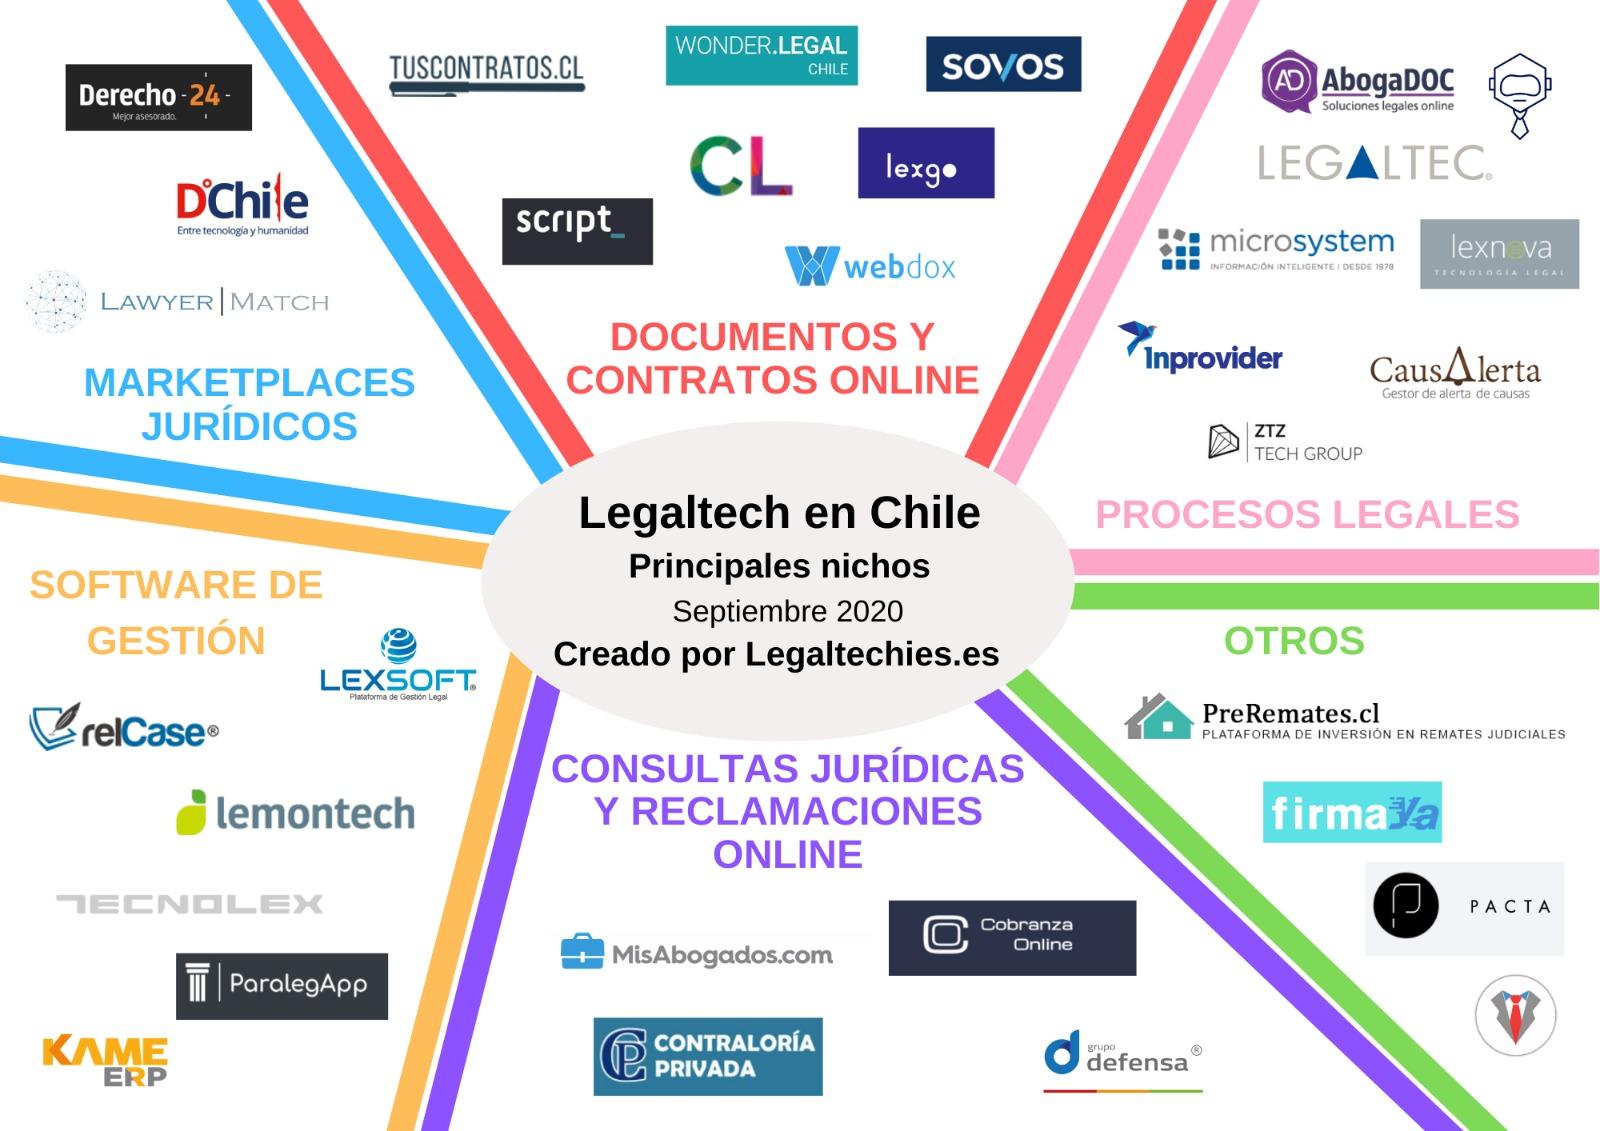 https://i0.wp.com/legaltechies.es/wp-content/uploads/2020/09/Mapa-Legaltech-Chile-1.jpg?ssl=1